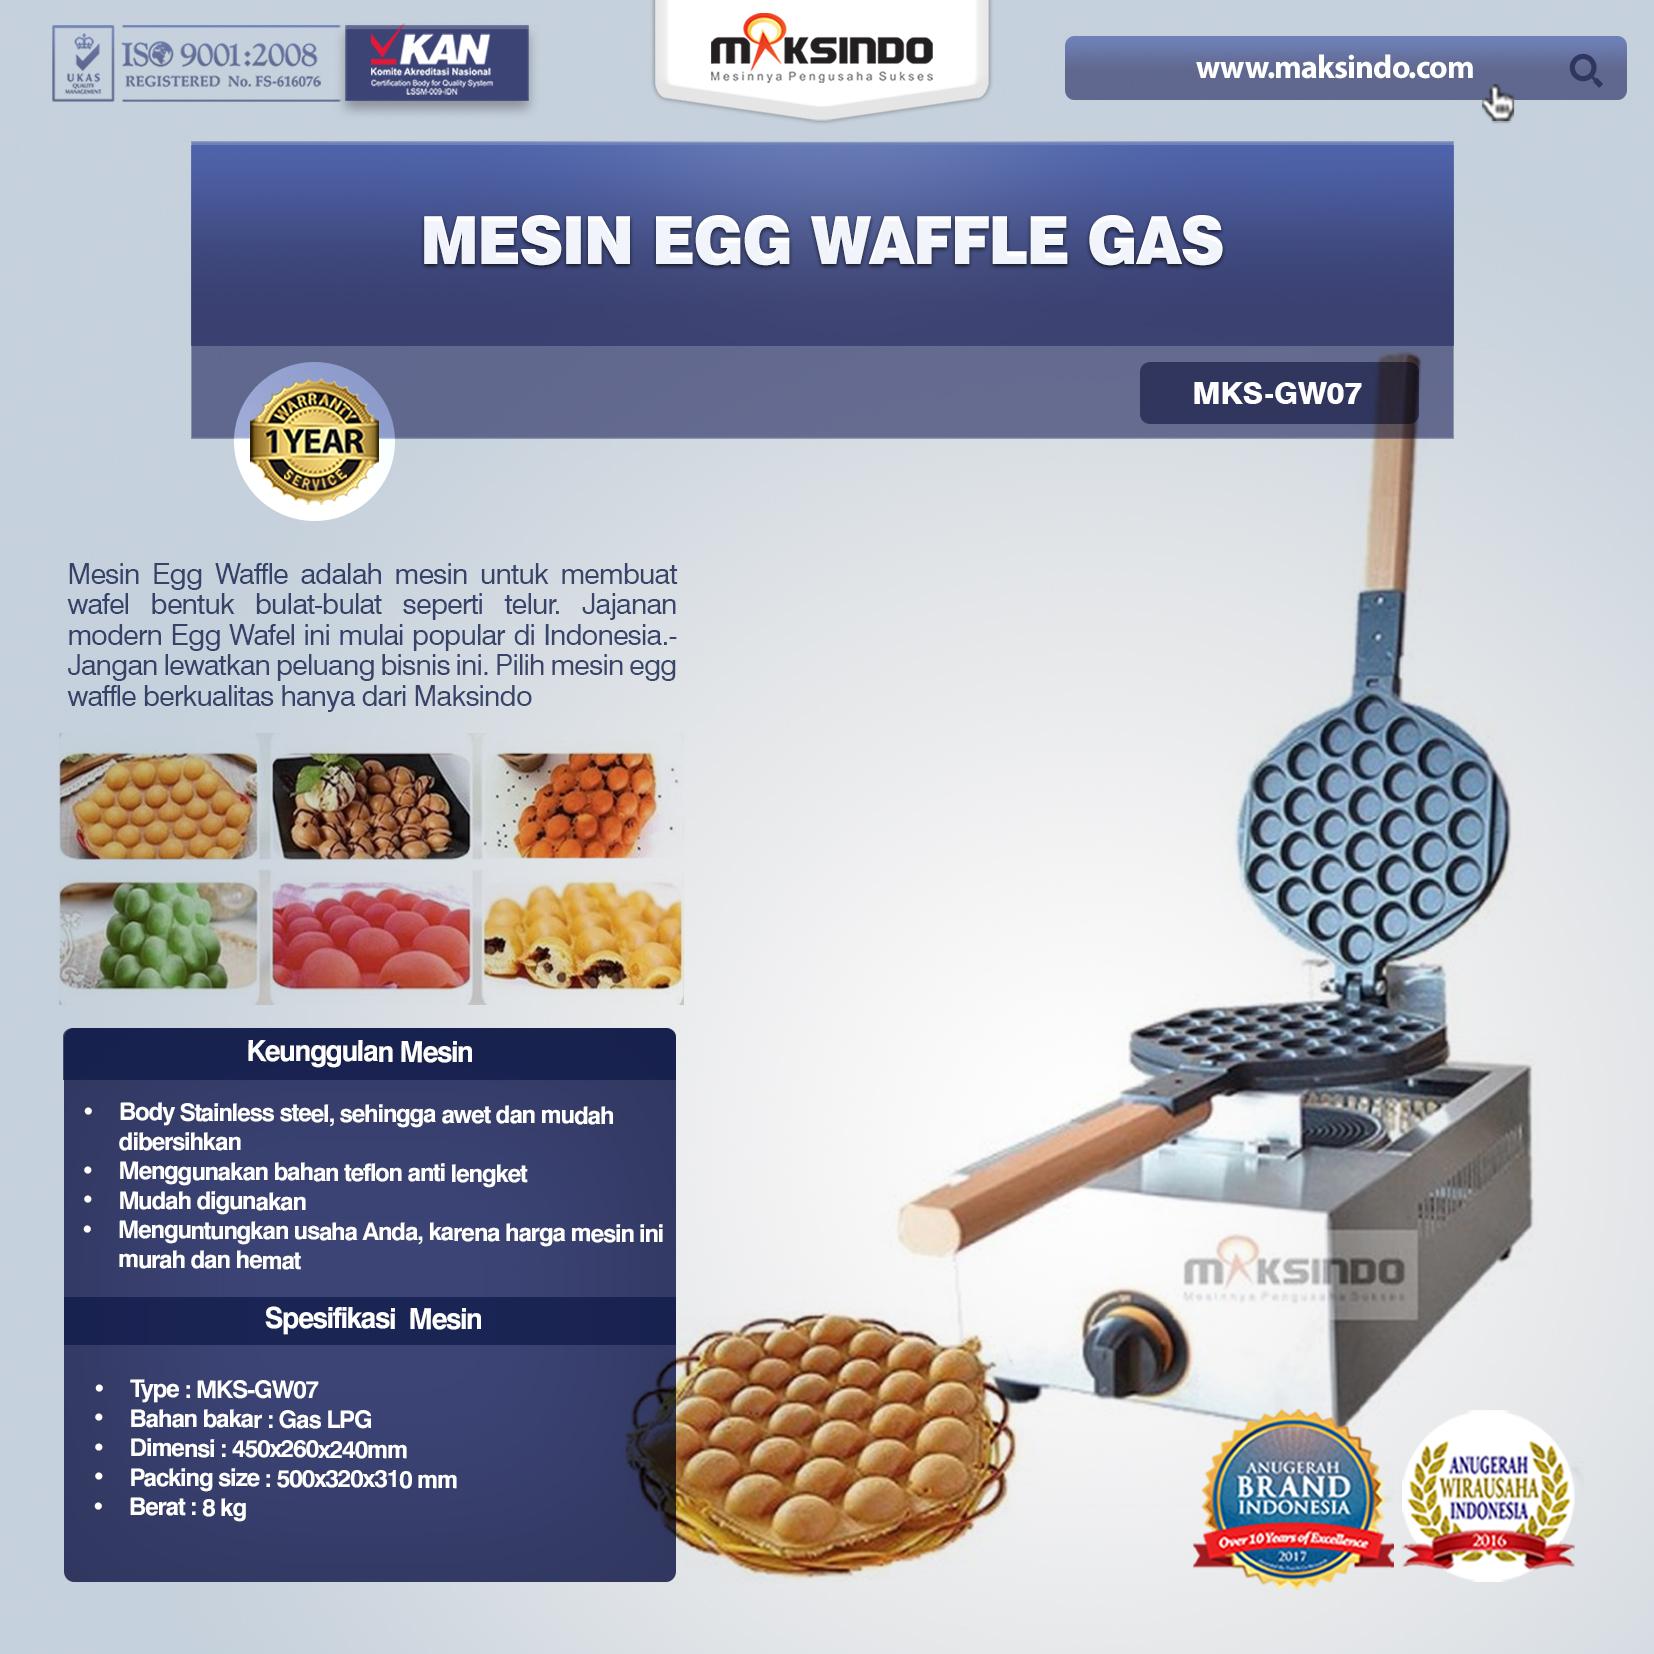 Mesin Egg Waffle Gas GW07